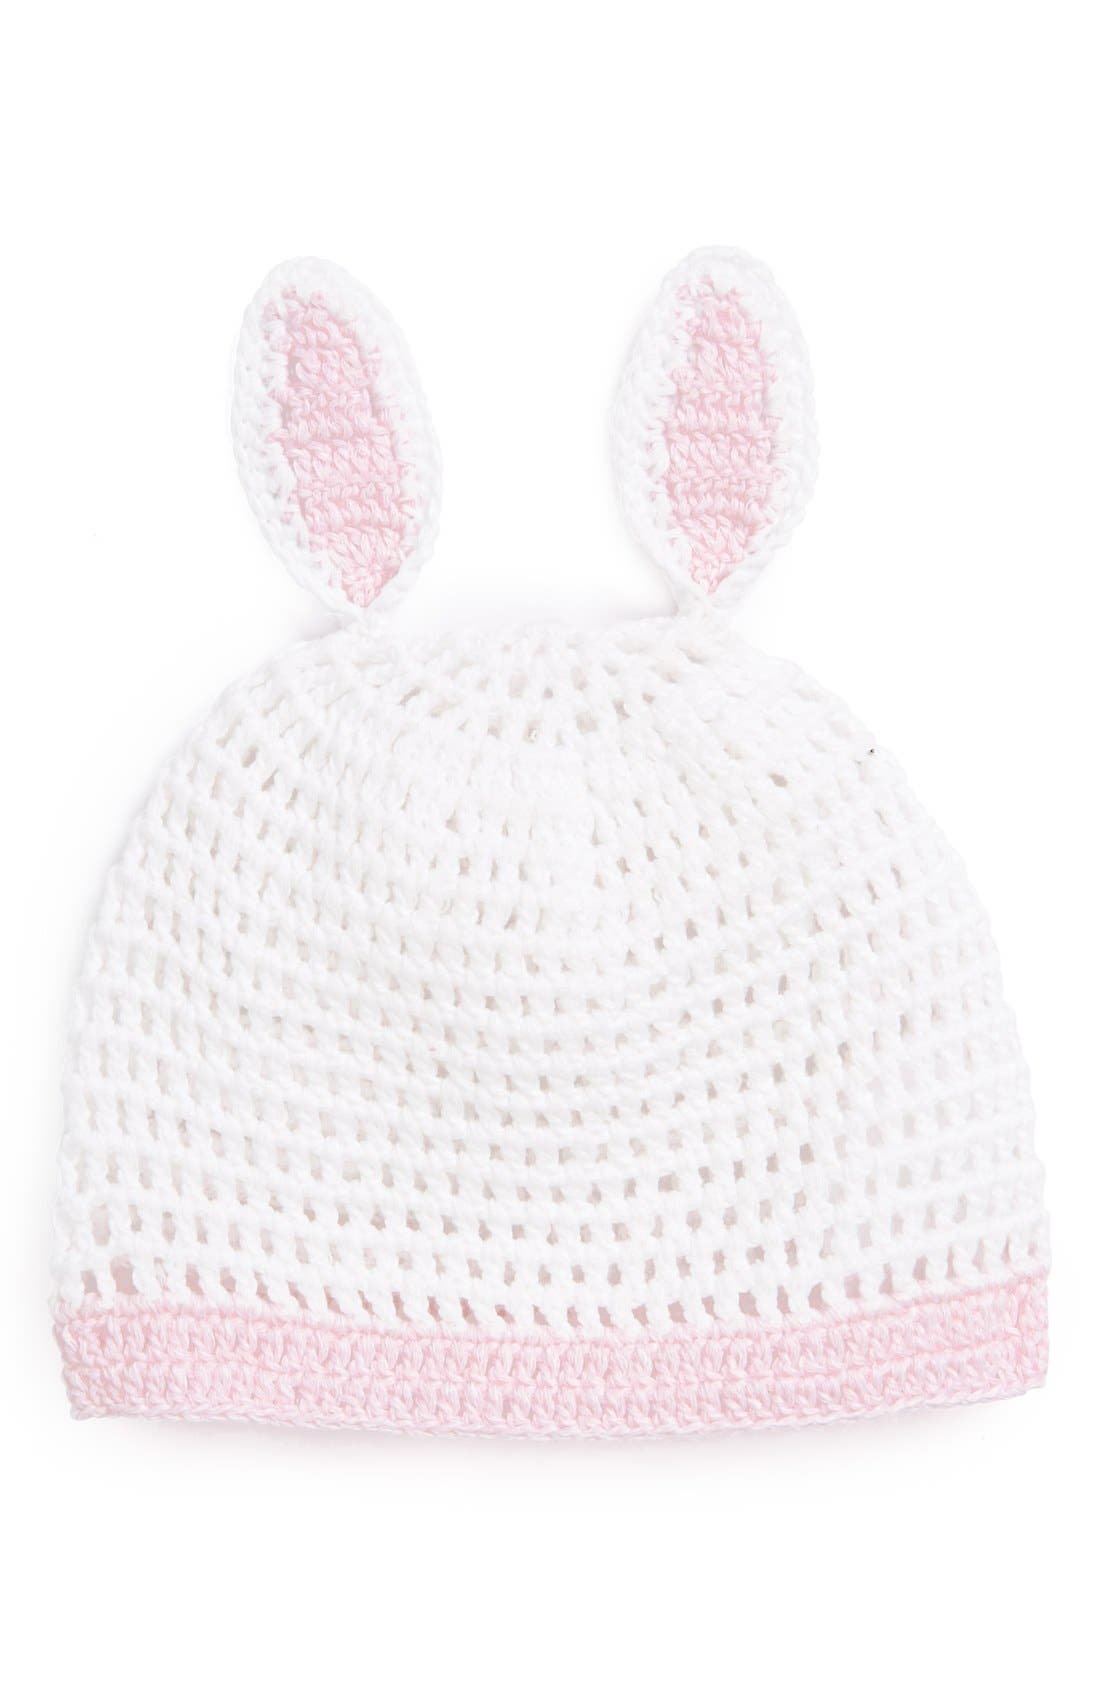 Alternate Image 1 Selected - Mud Pie 'Bunny' Crochet Hat (Baby Girls)